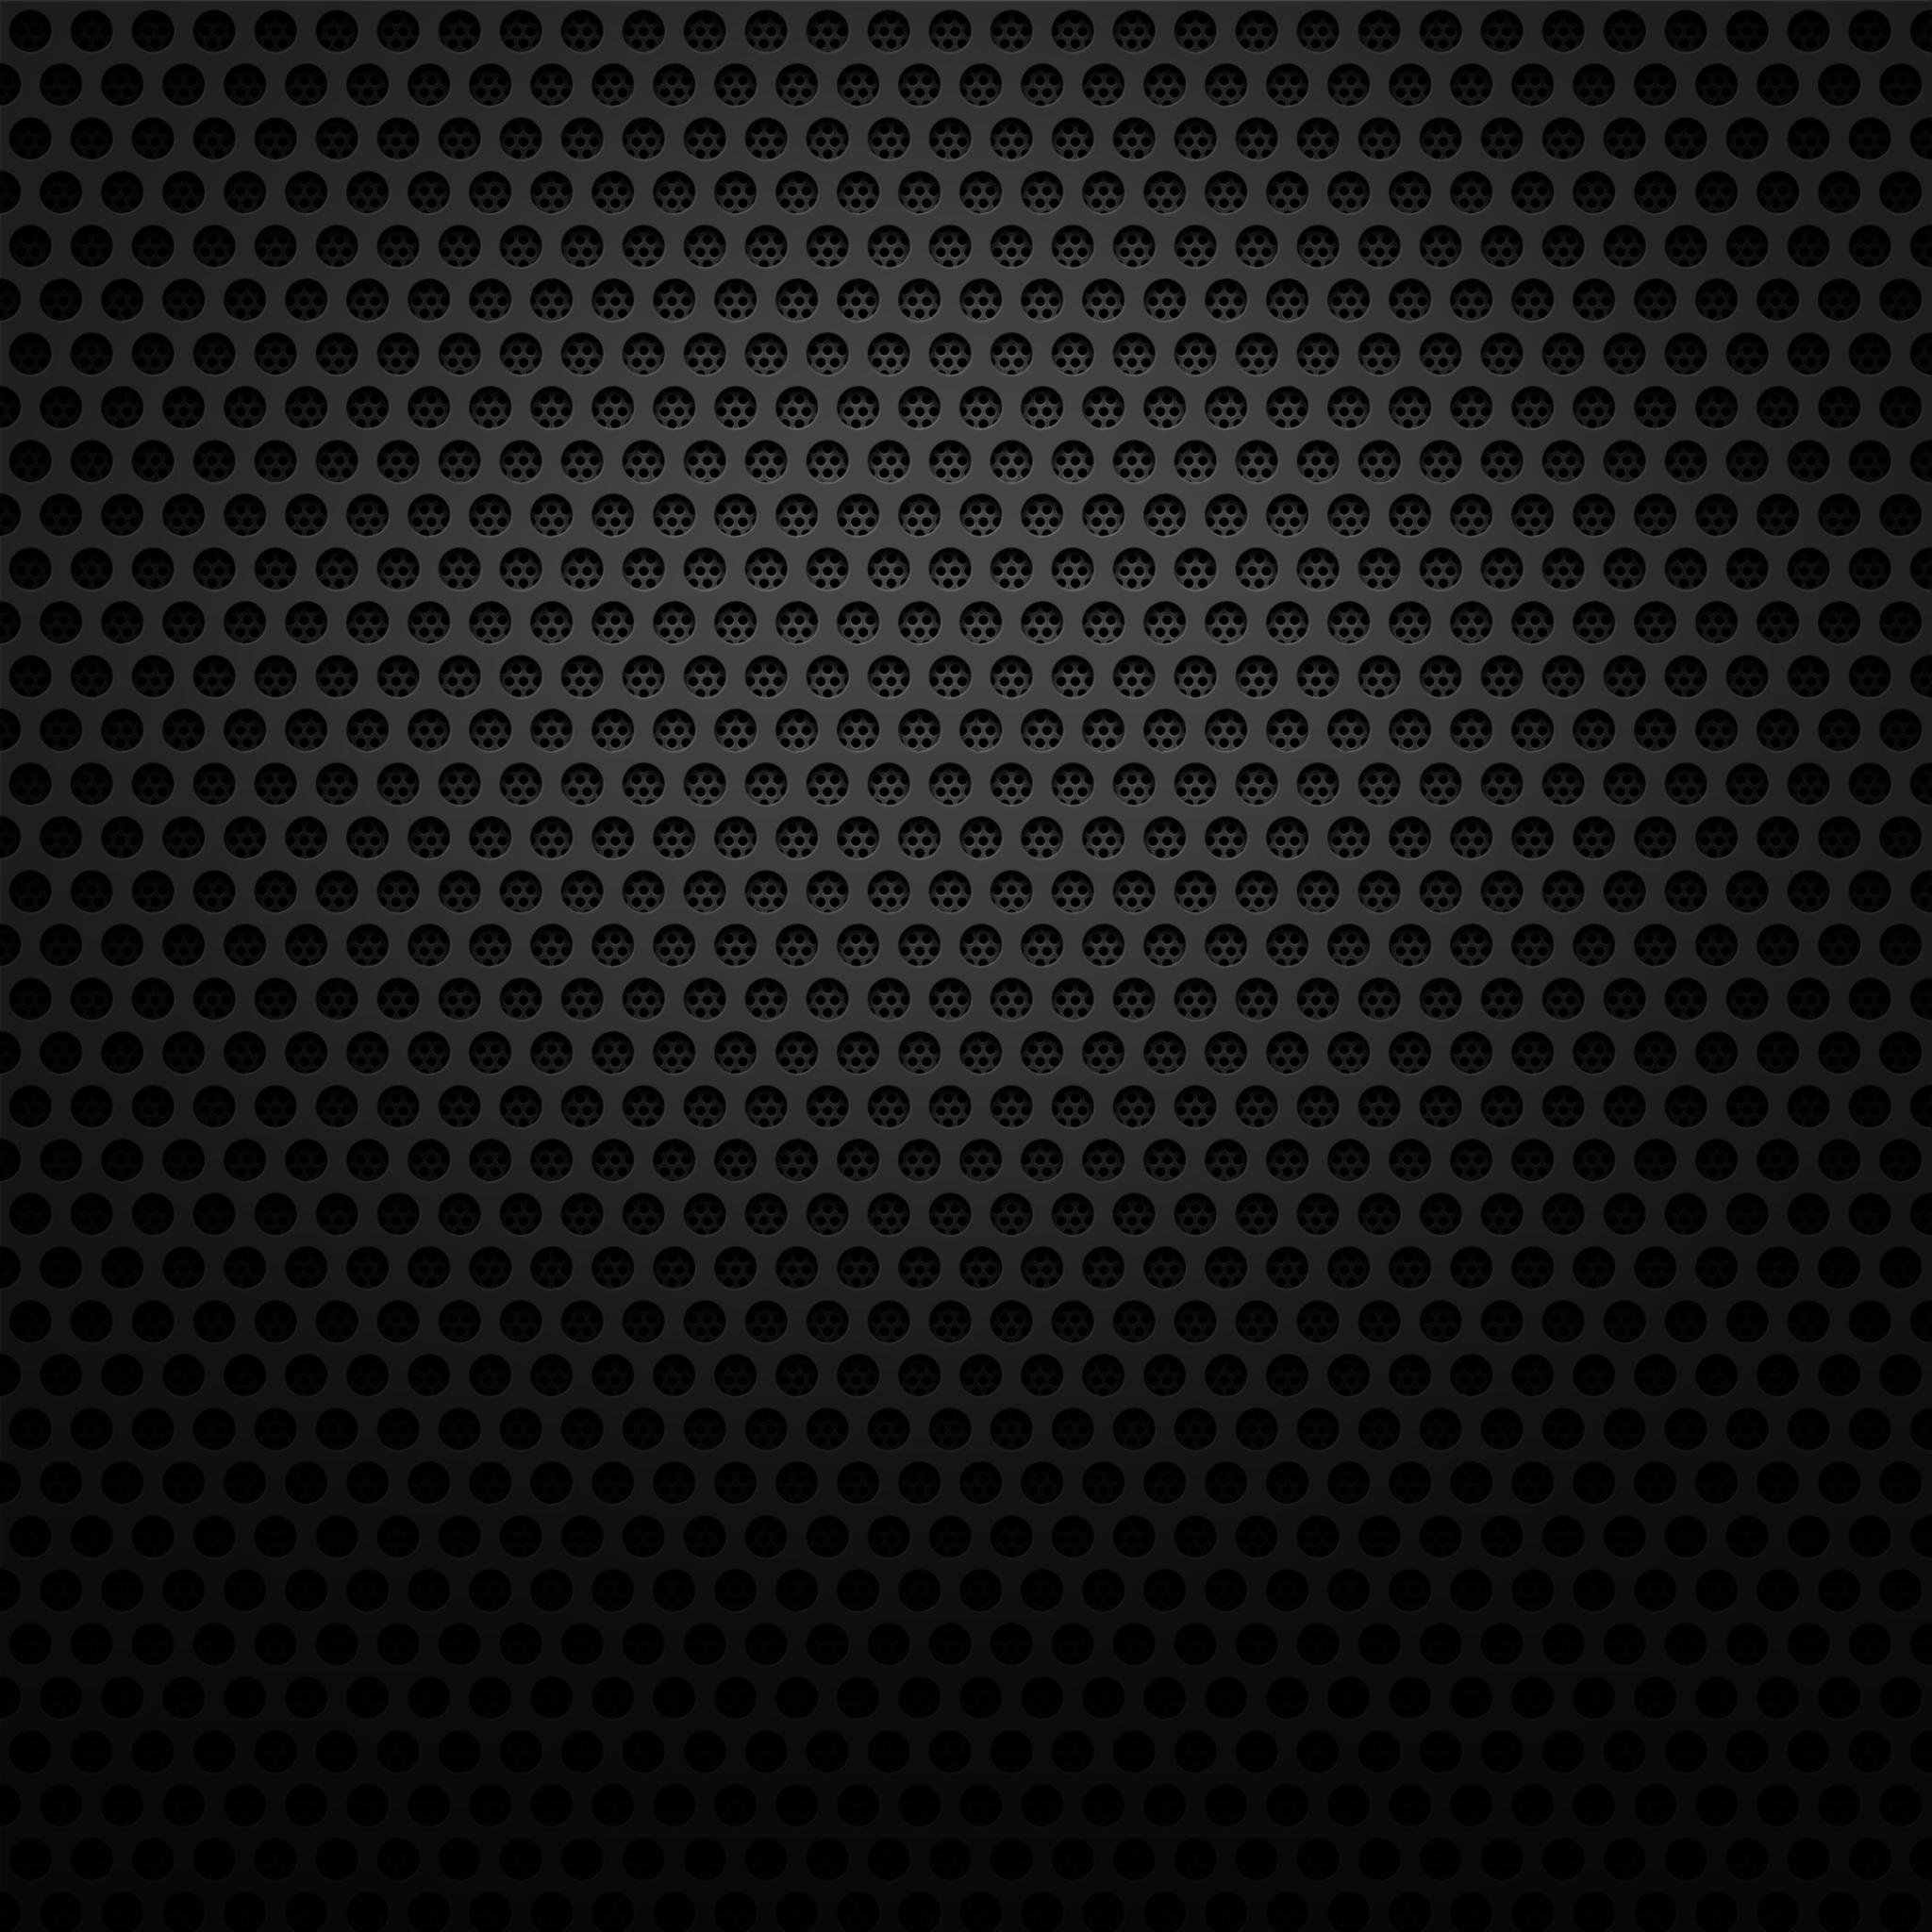 Plain Black Iphone Wallpaper Ipad 4 Wallpapers Wallpaper For 4th Generation Ipad